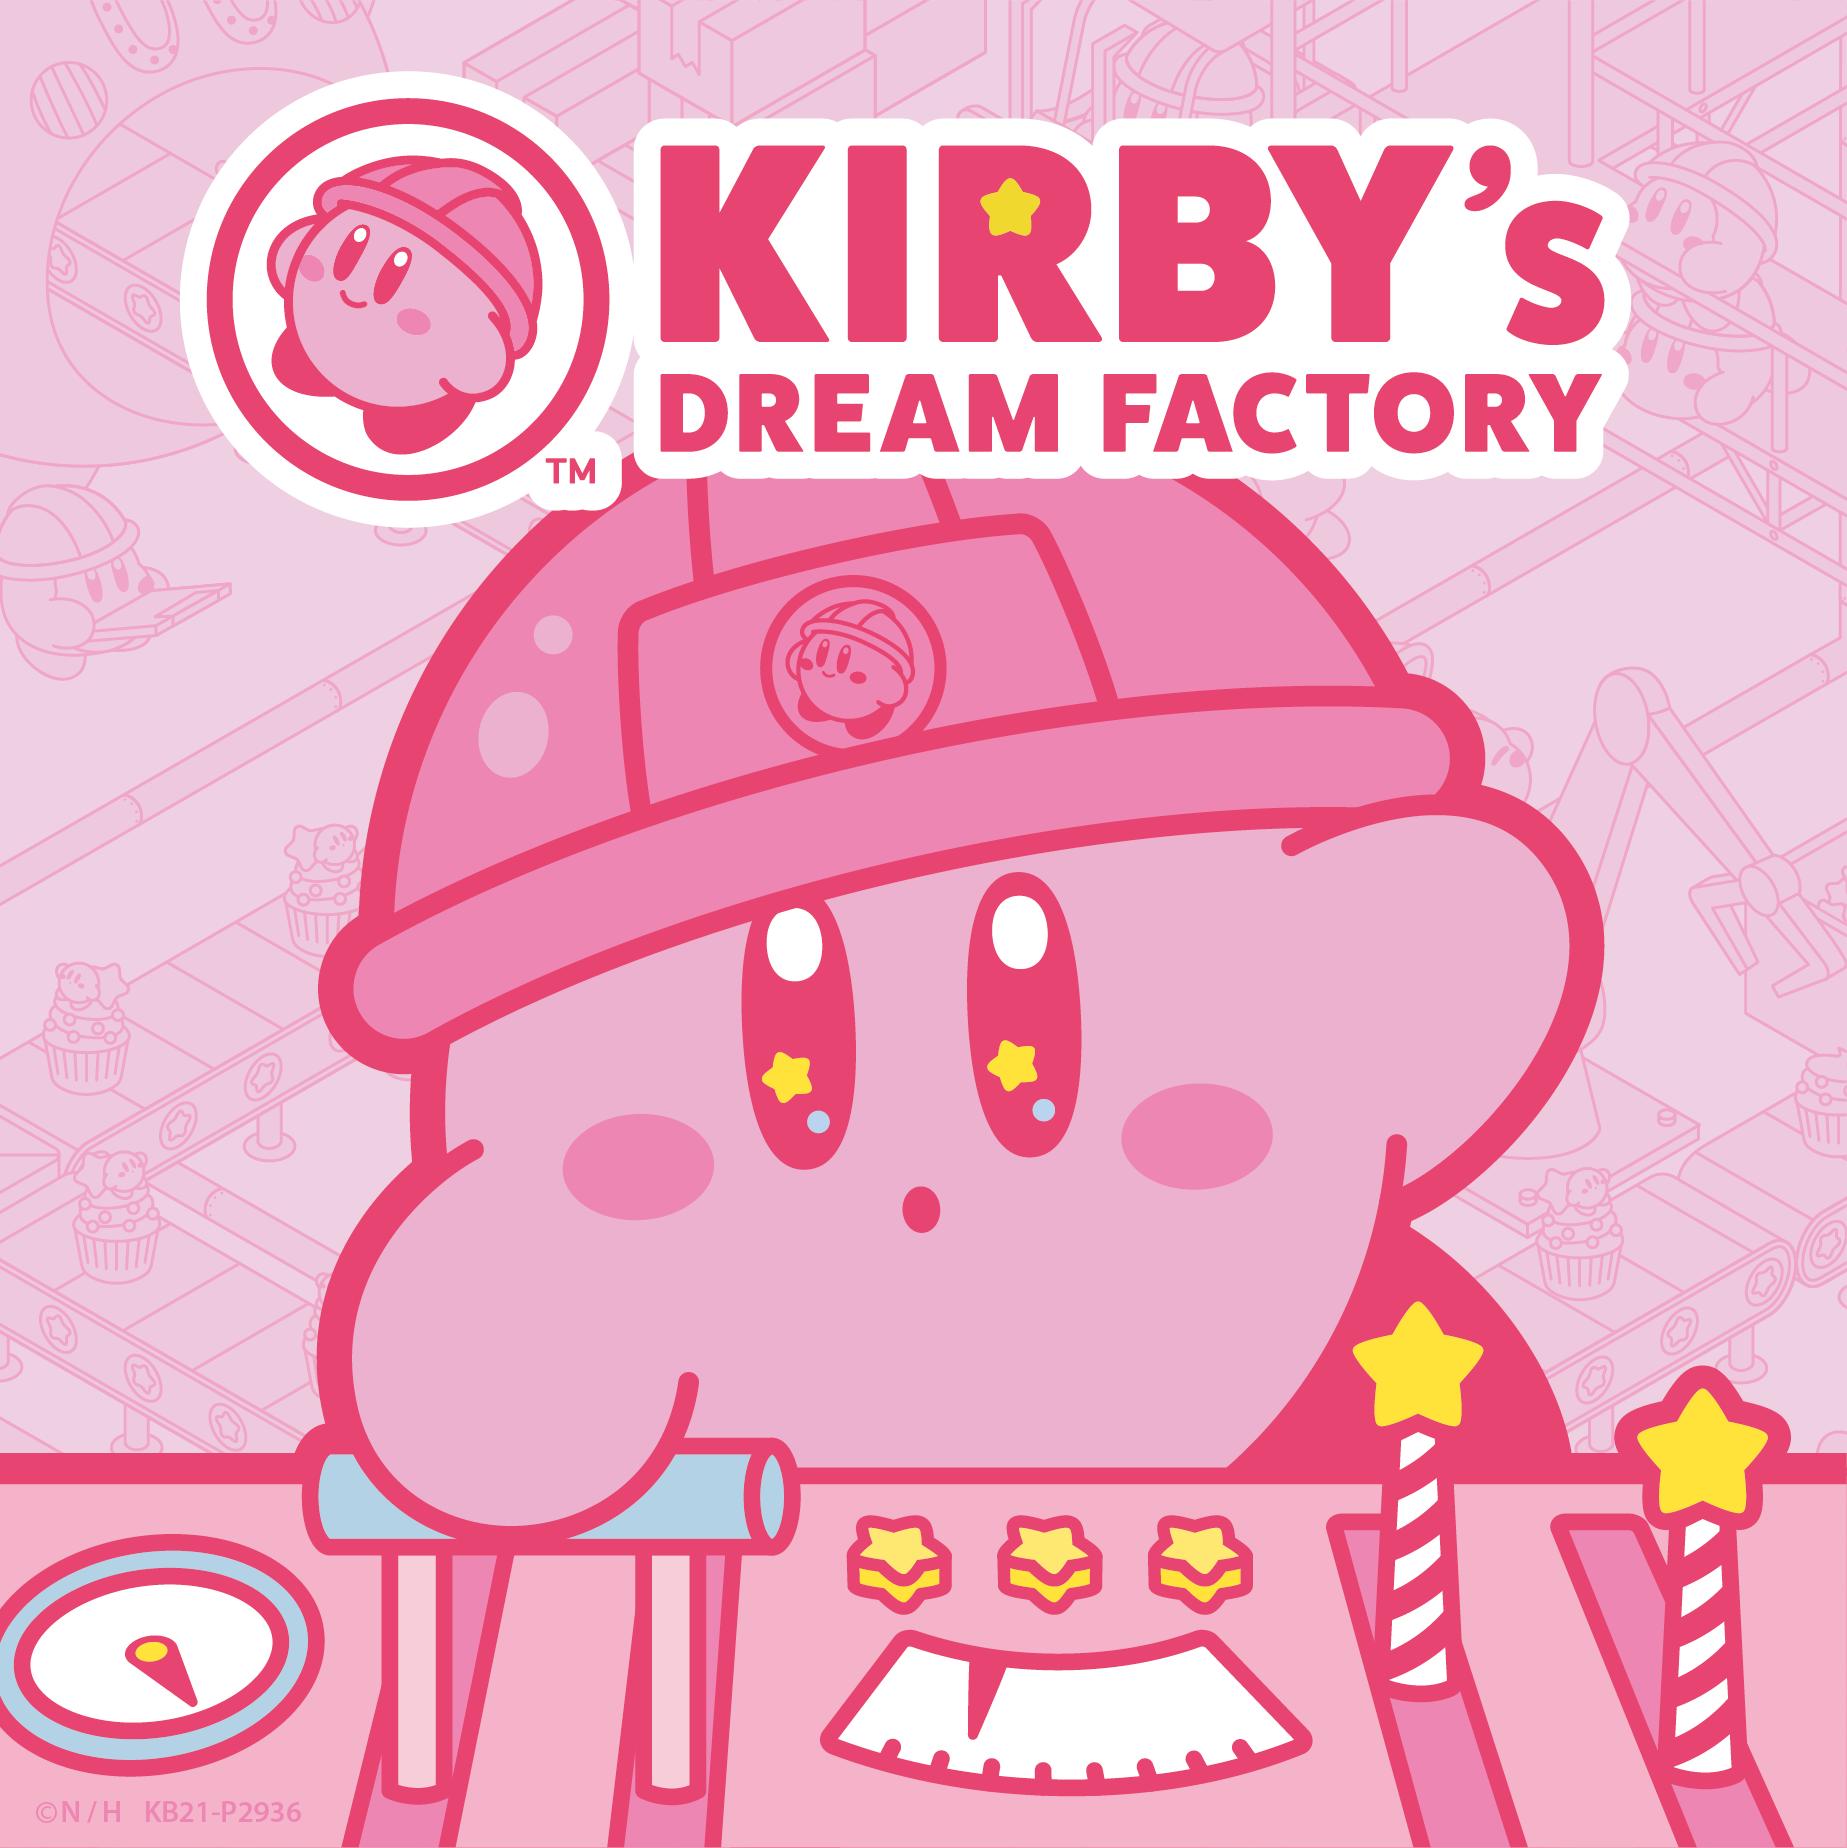 KIRBY's DREAM FACTORY